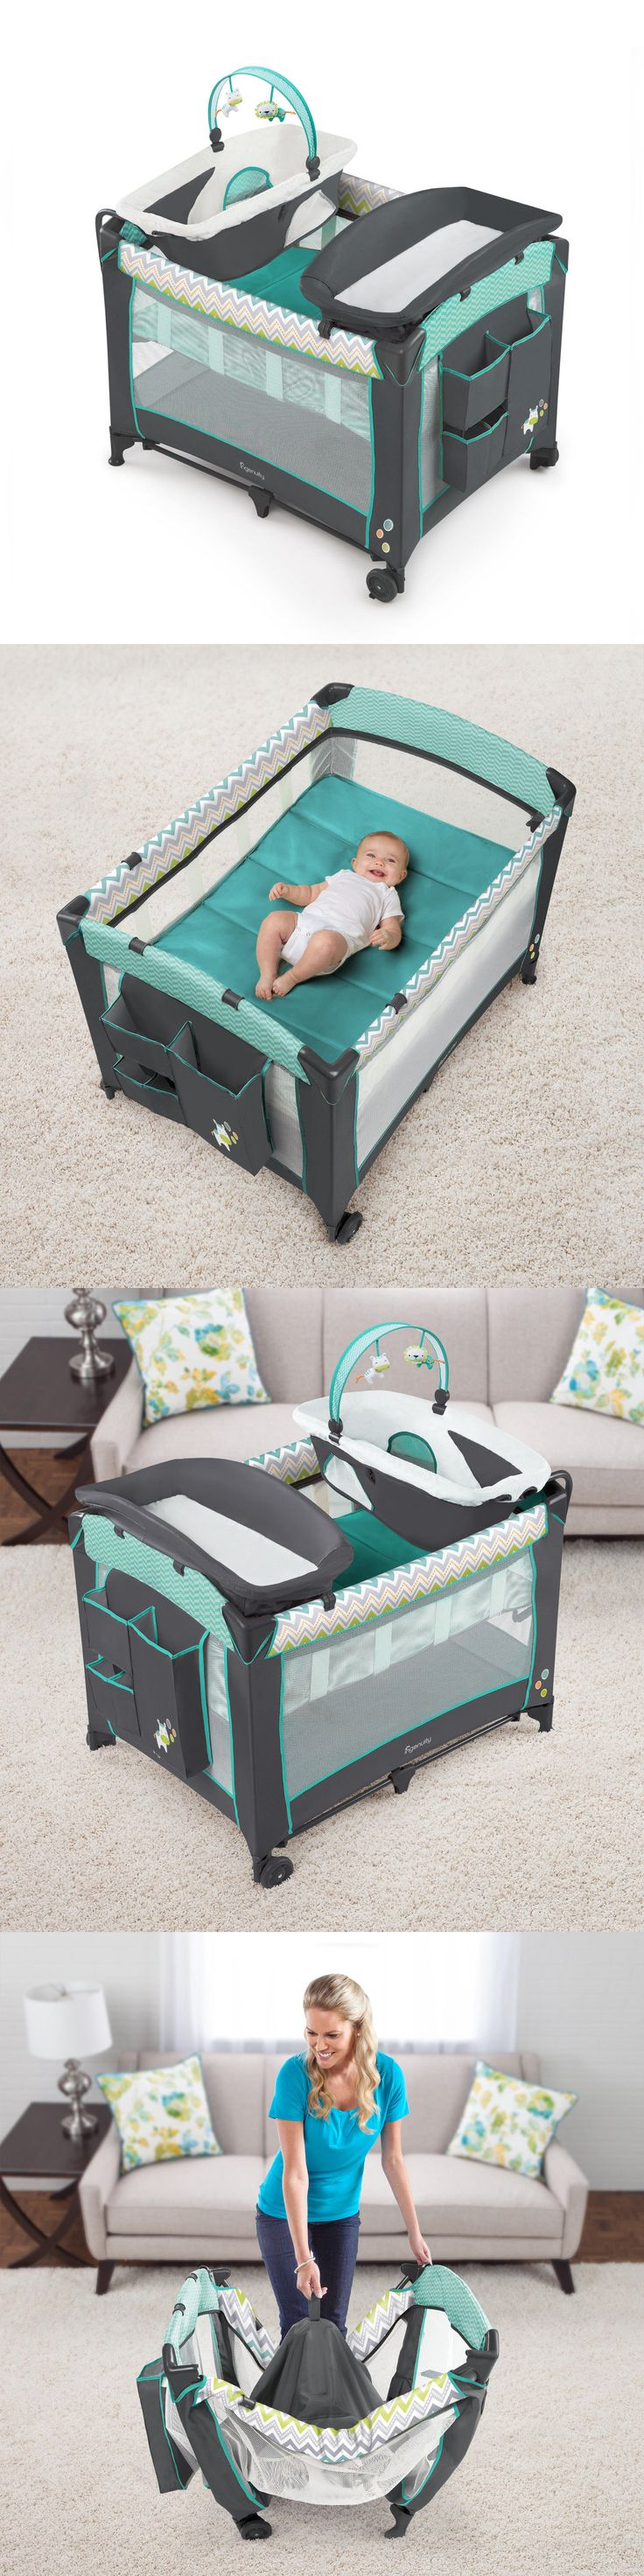 Farg form baby changing table mat grey clouds - Baby Nursery Baby Nursery Bassinet Infant Sleeper Crib Newborn Playard Folding Changing Table Buy It